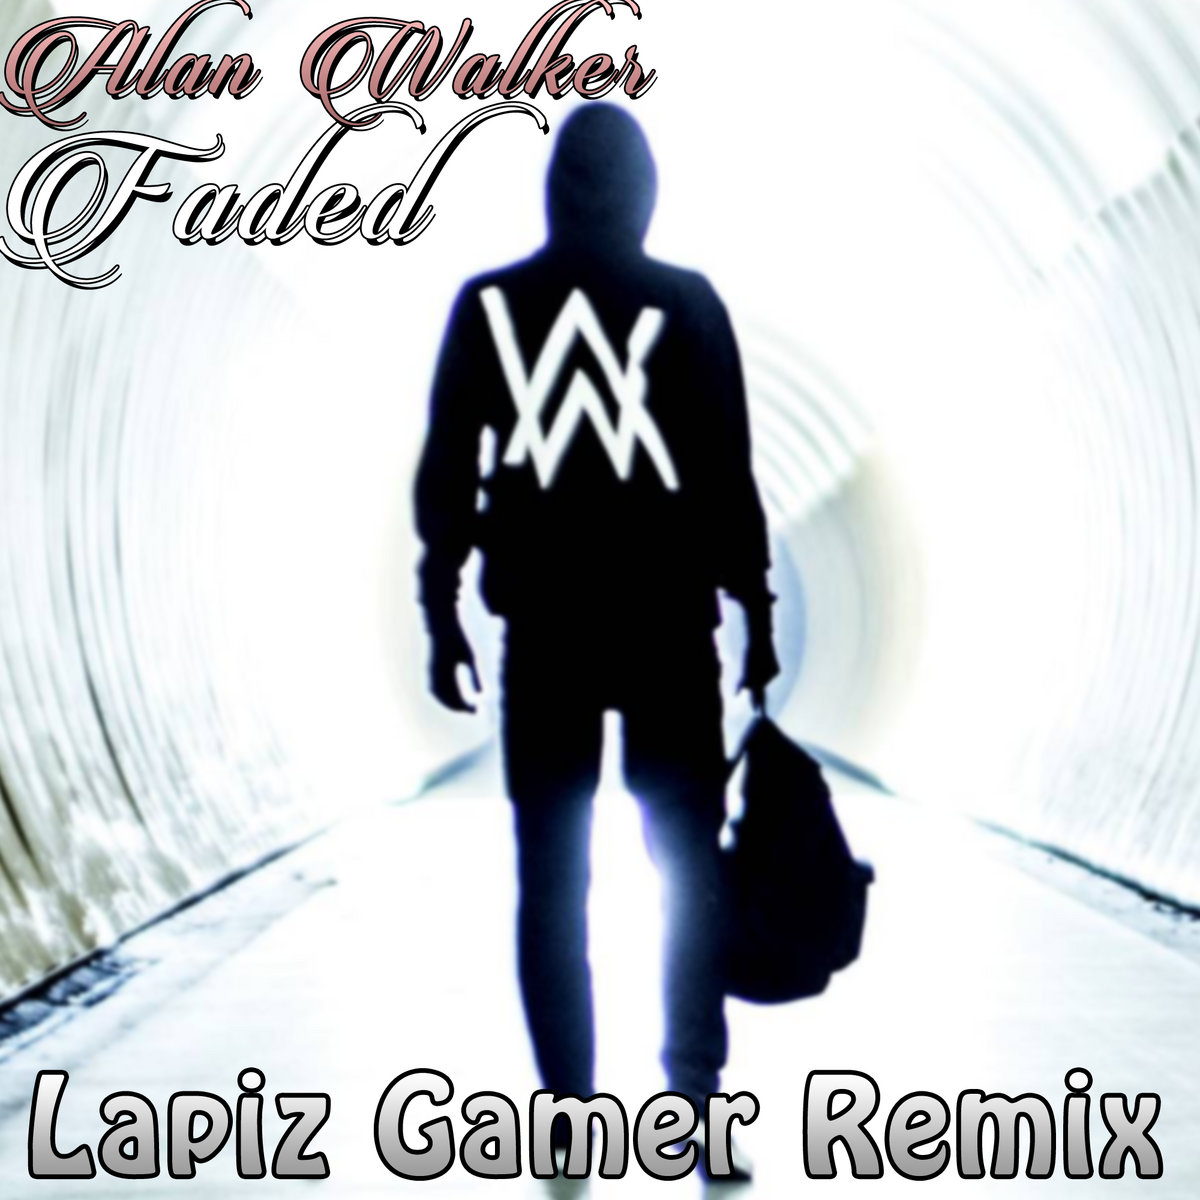 Alan Walker - Faded (Lapiz Gamer remix) | LG_Music